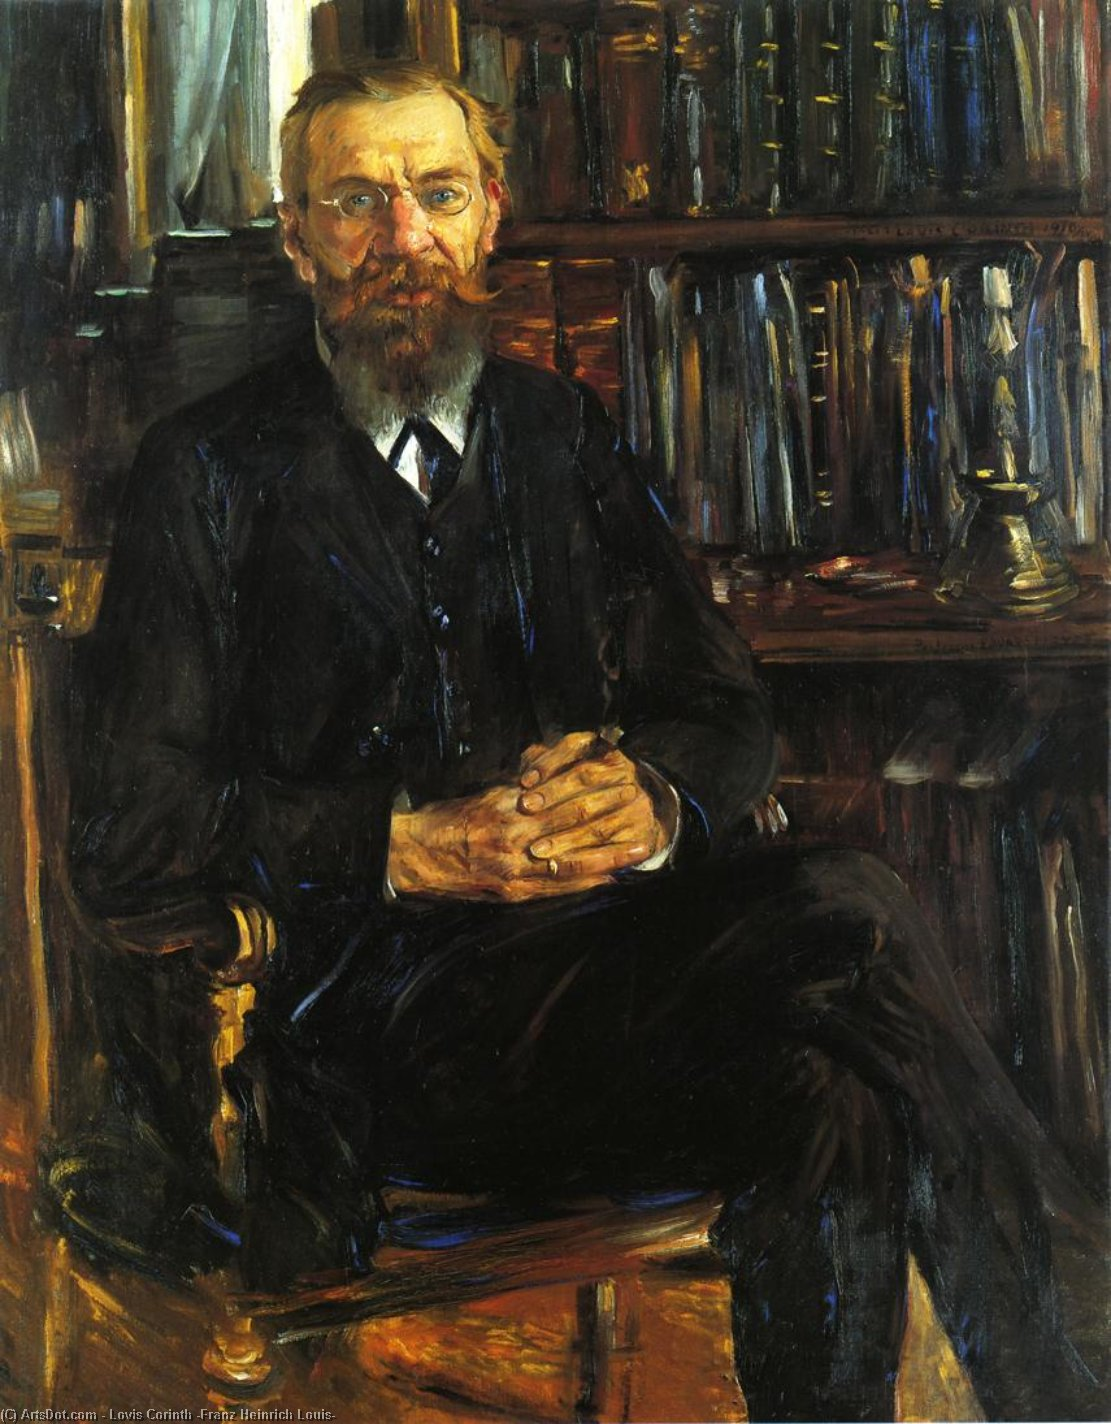 Wikioo.org - The Encyclopedia of Fine Arts - Painting, Artwork by Lovis Corinth (Franz Heinrich Louis) - Portrait of Professor Eduard Meyer